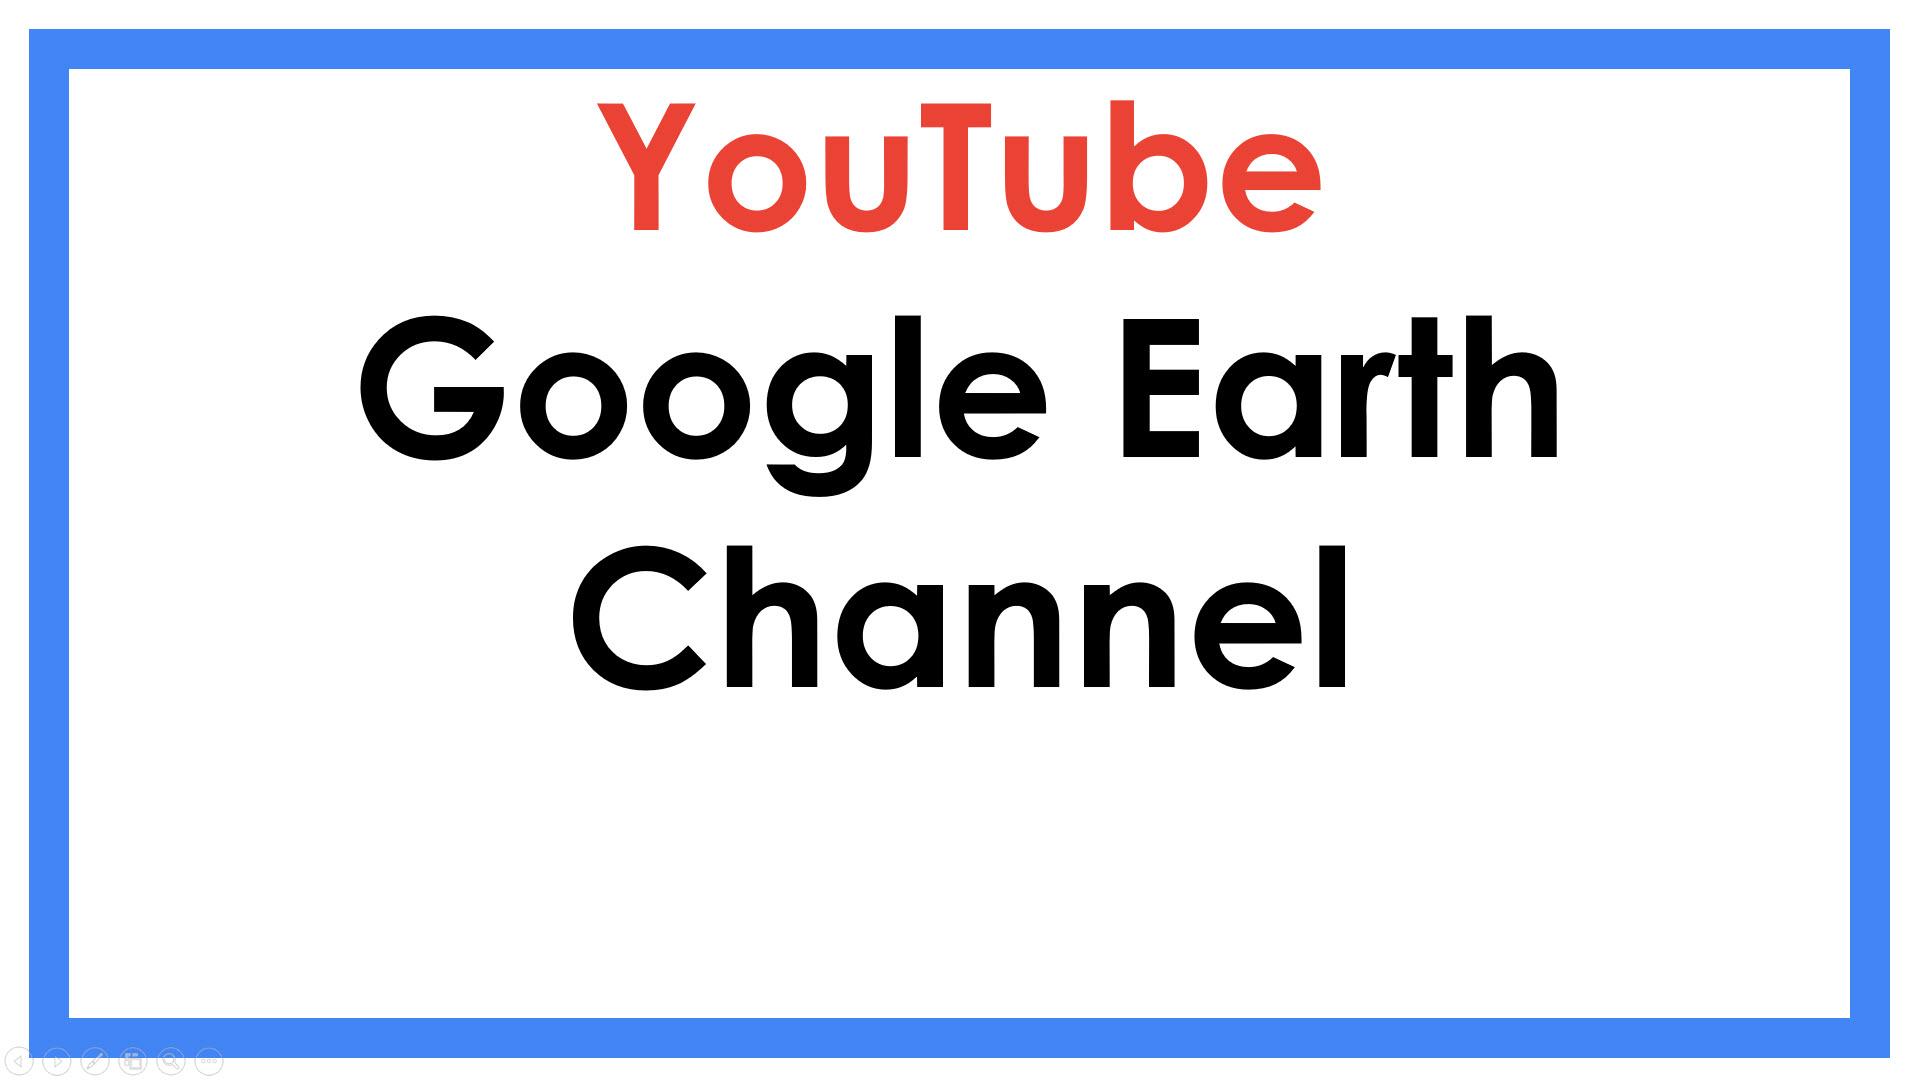 Google Earth Channel